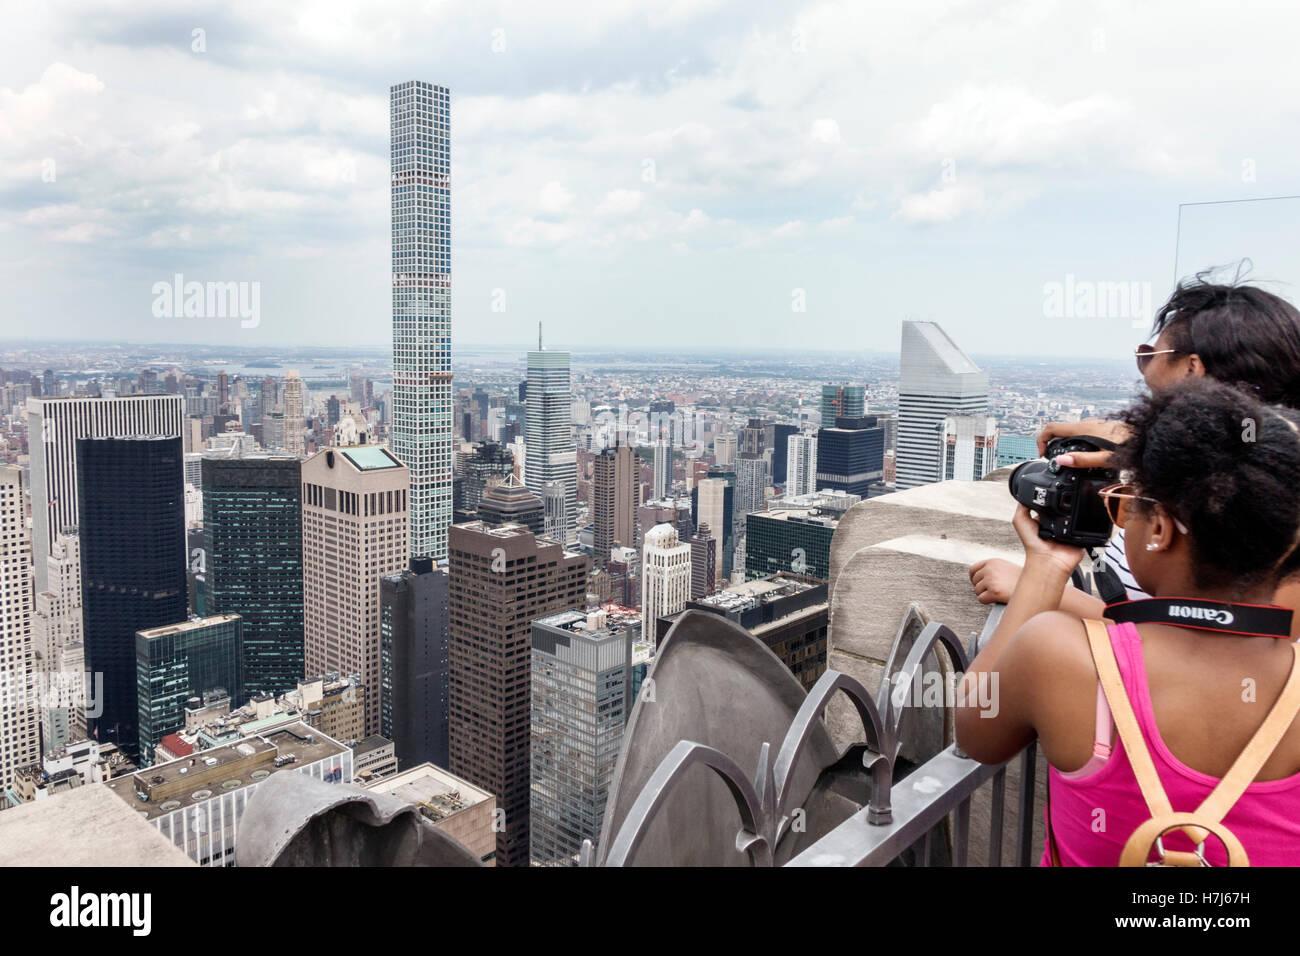 30 Rock Camera : Manhattan new york city nyc new york midtown 30 rockefeller center